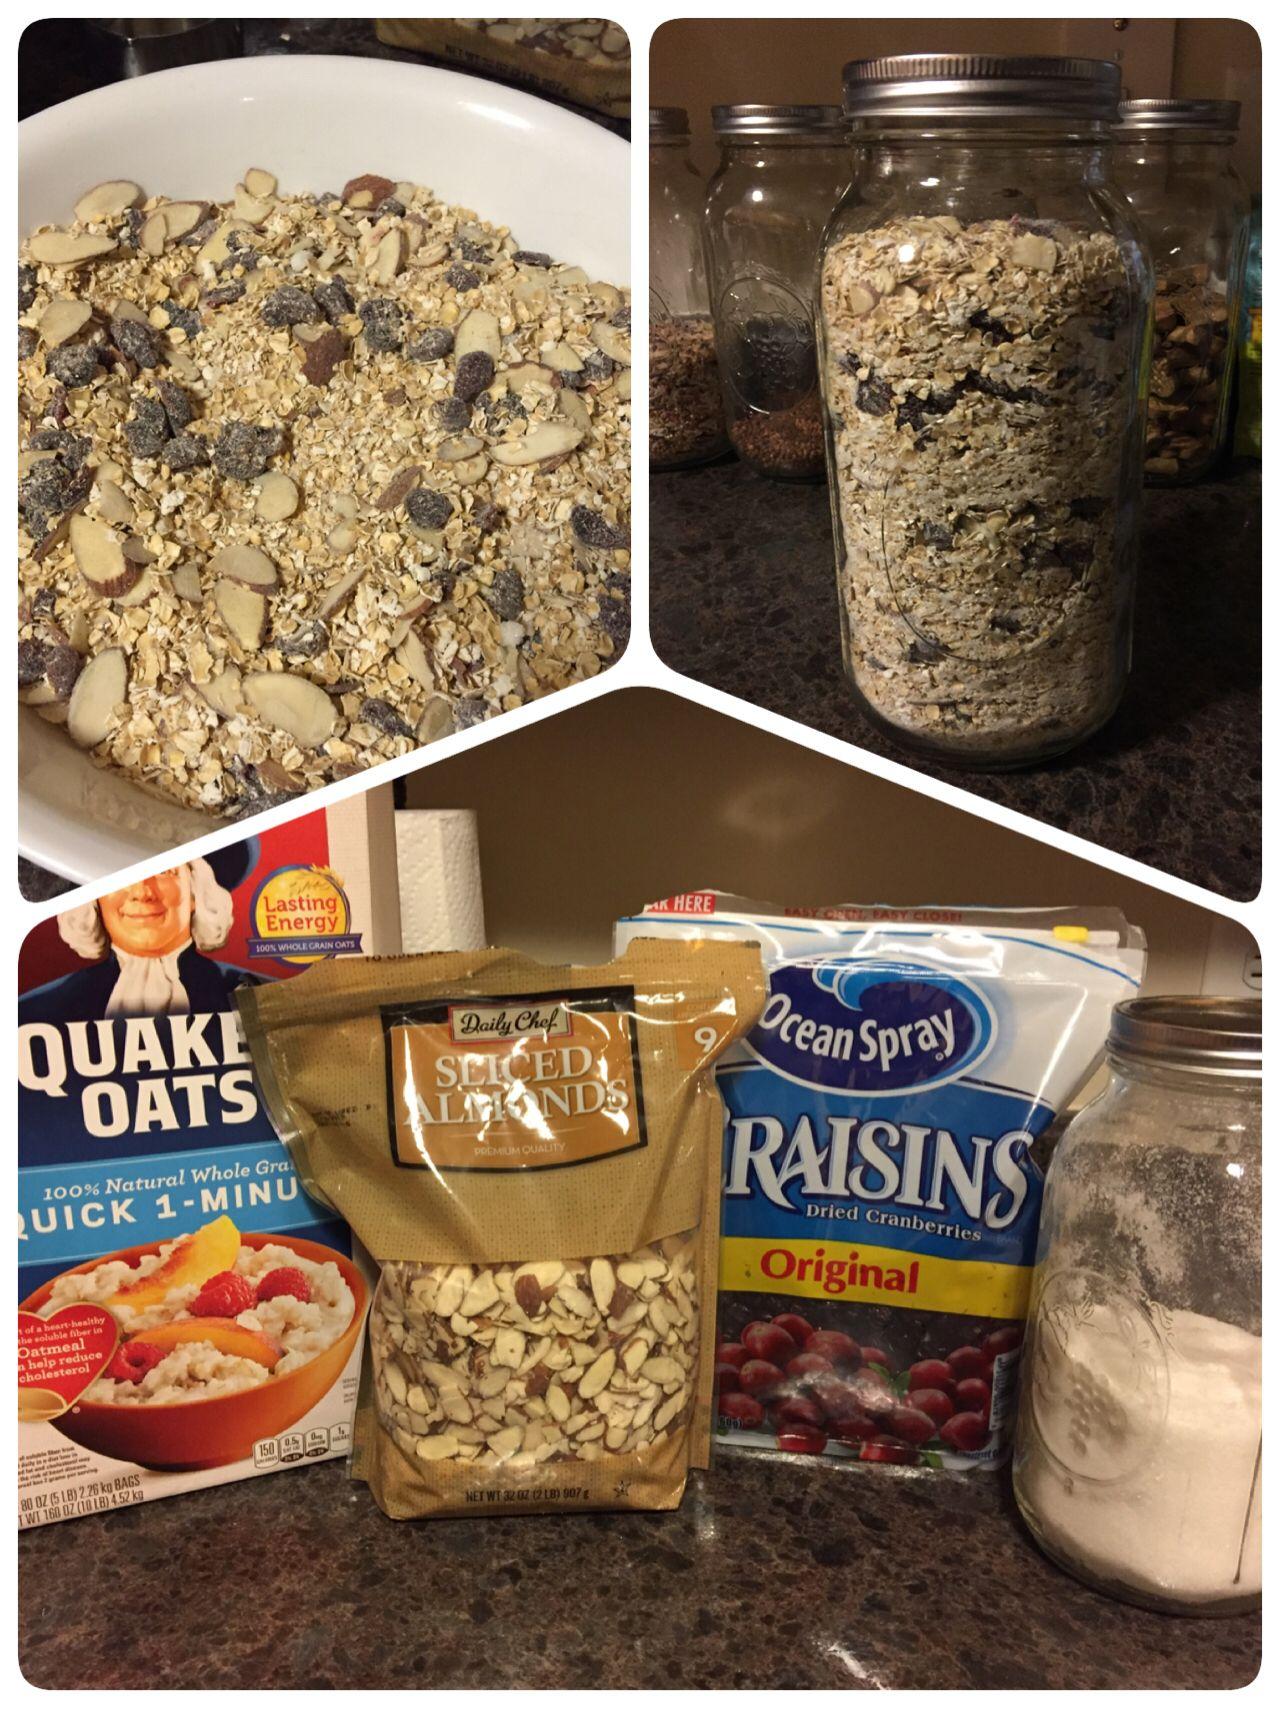 Homemade 1 minute oatmeal 4c quaker oats quick 1 min 1